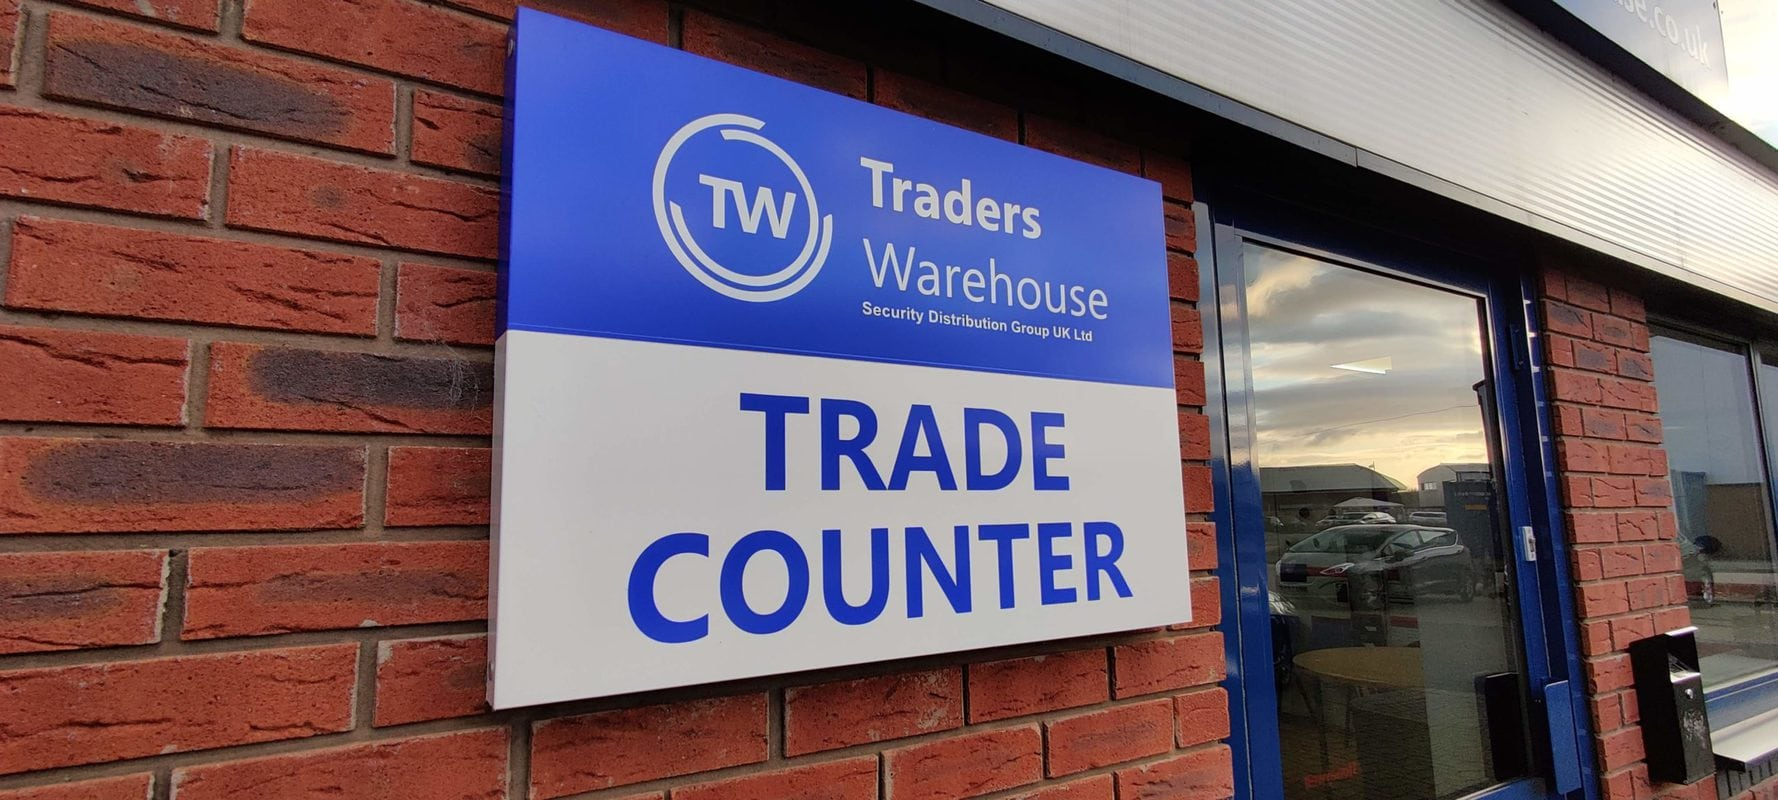 Traders Warehouse trade counter